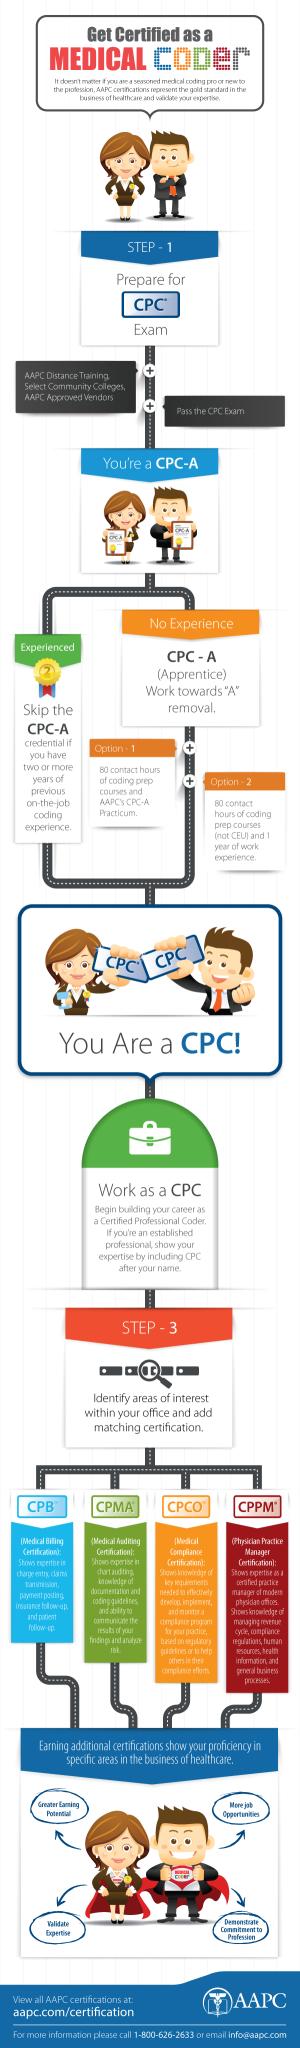 Become_A_CPC